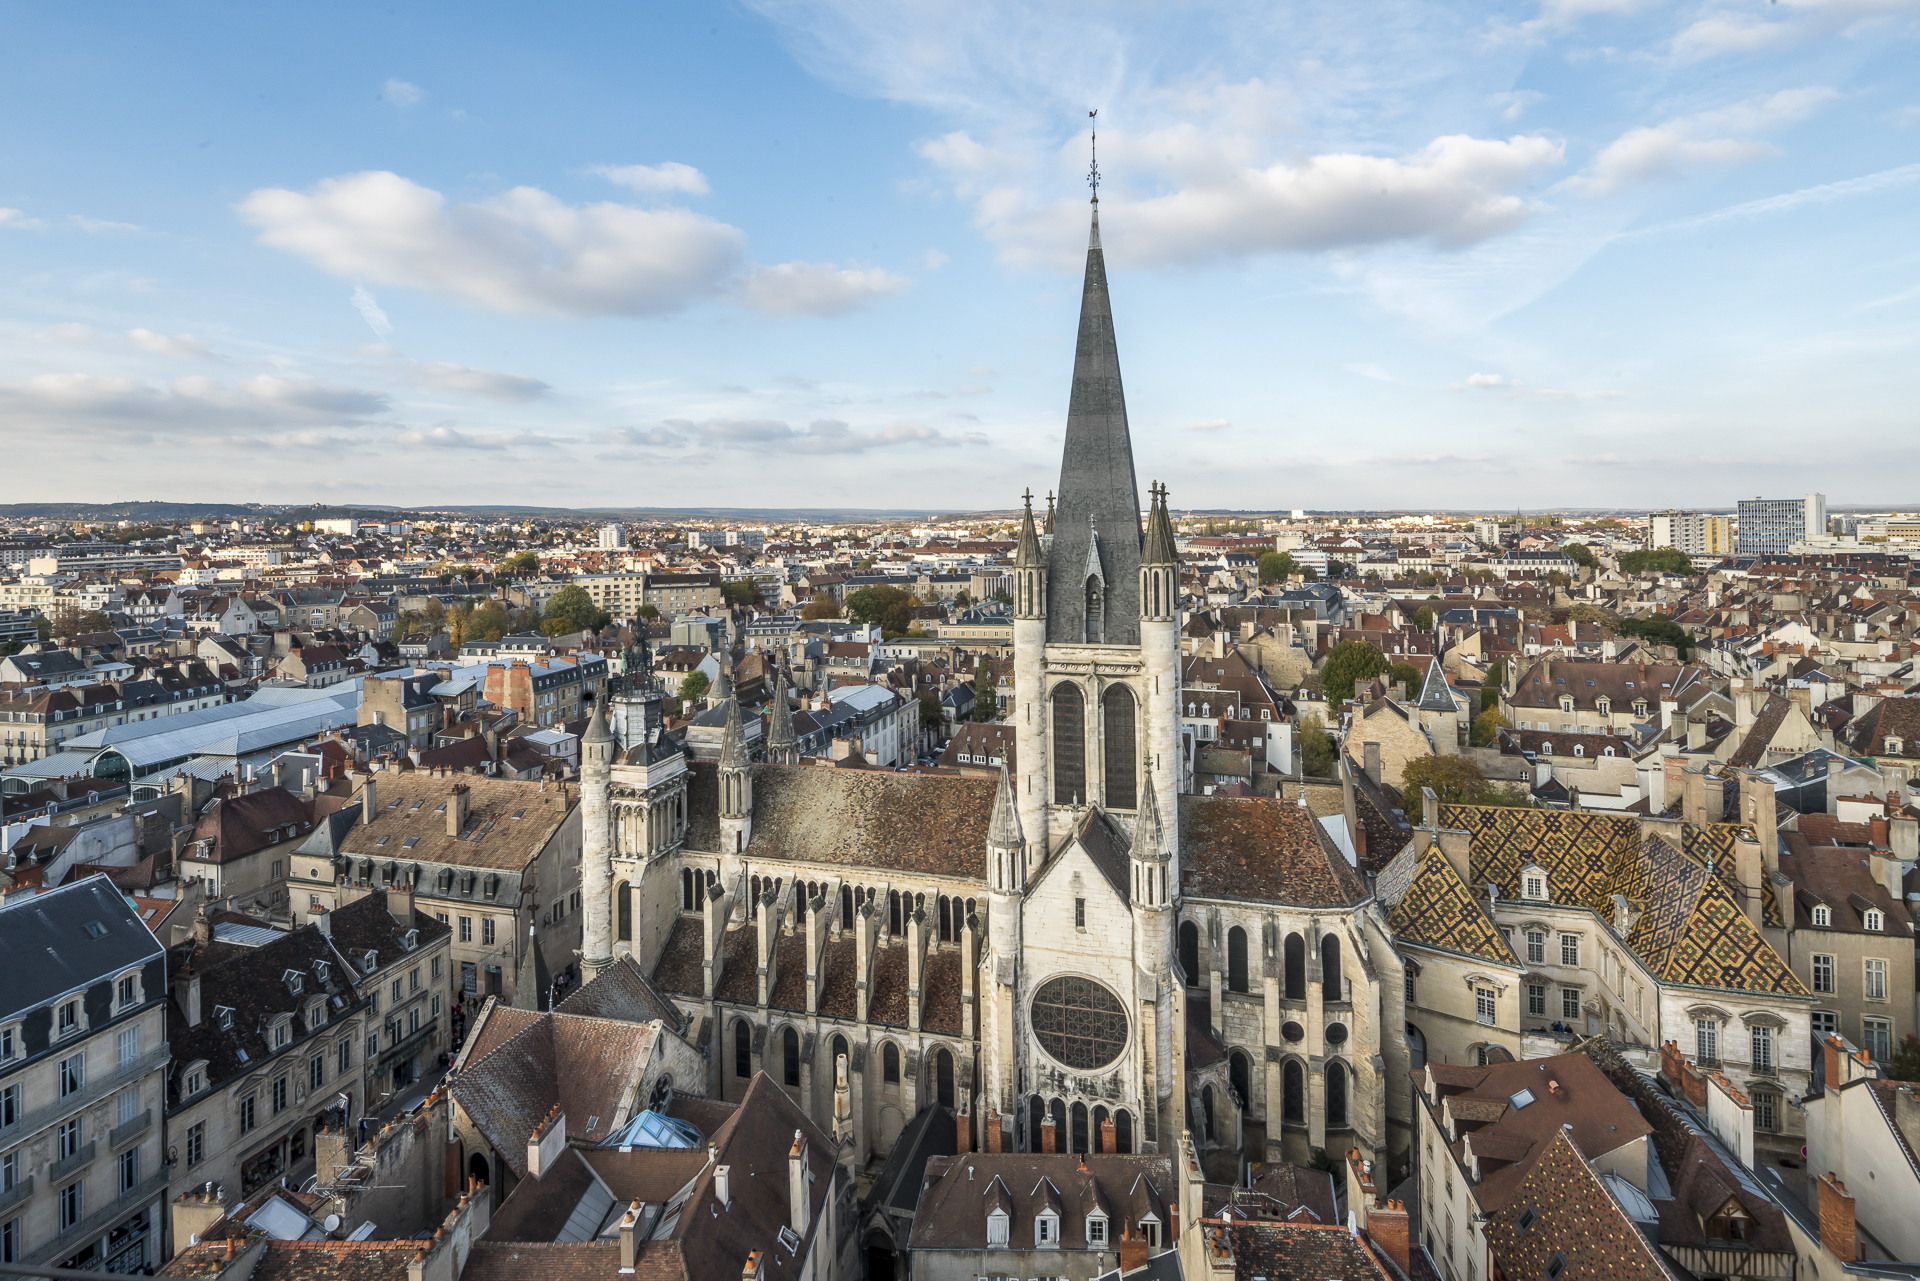 Dijon Notre Dame